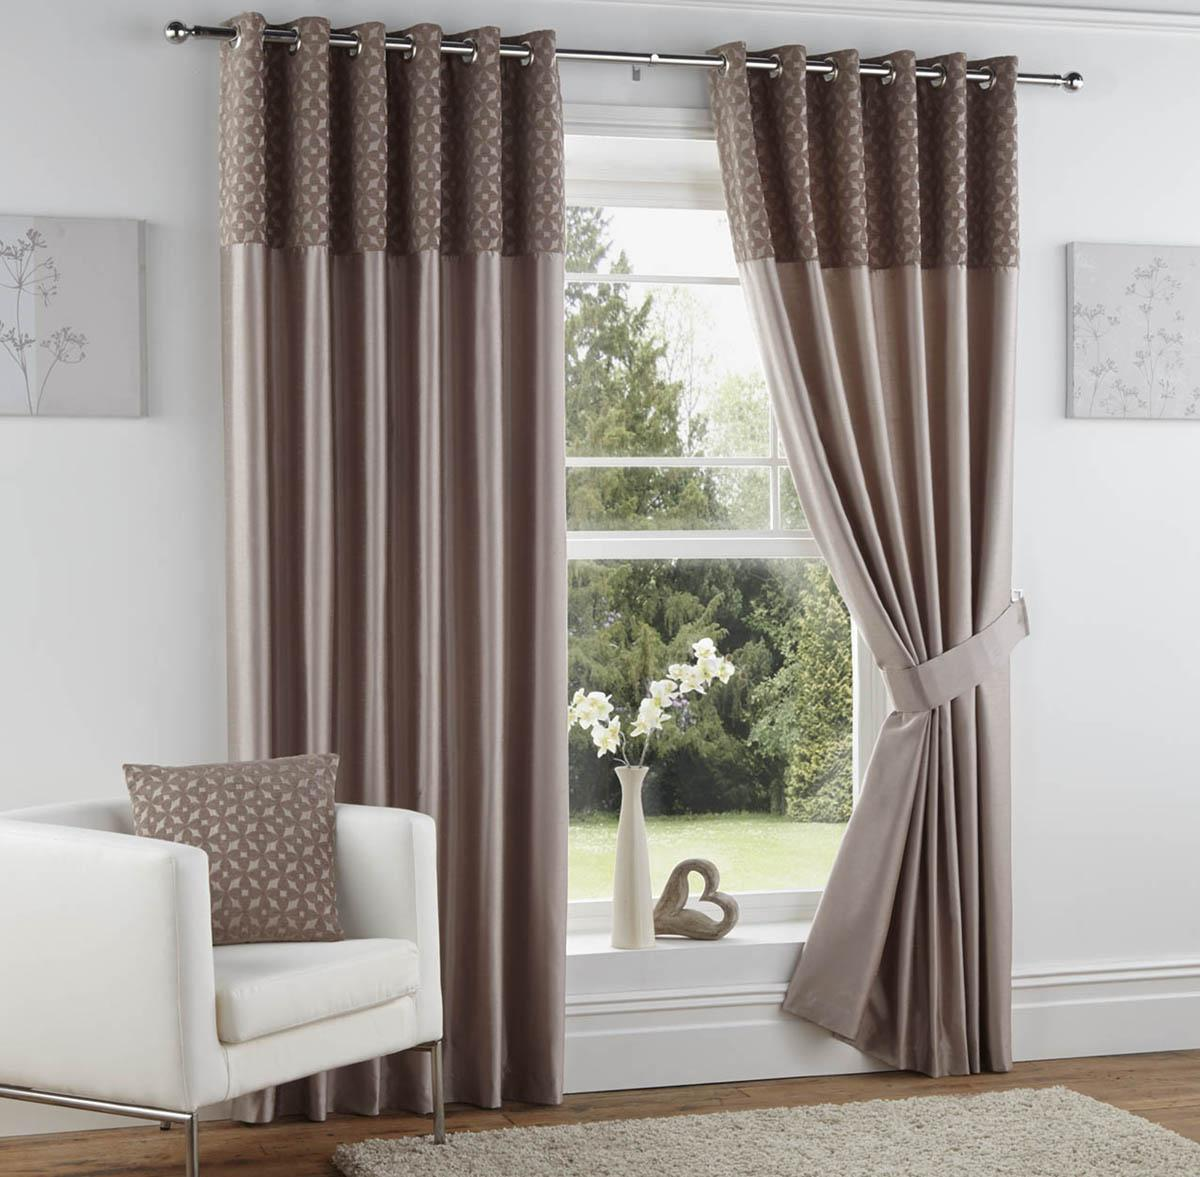 Woburn Ready Made Eyelet Curtains